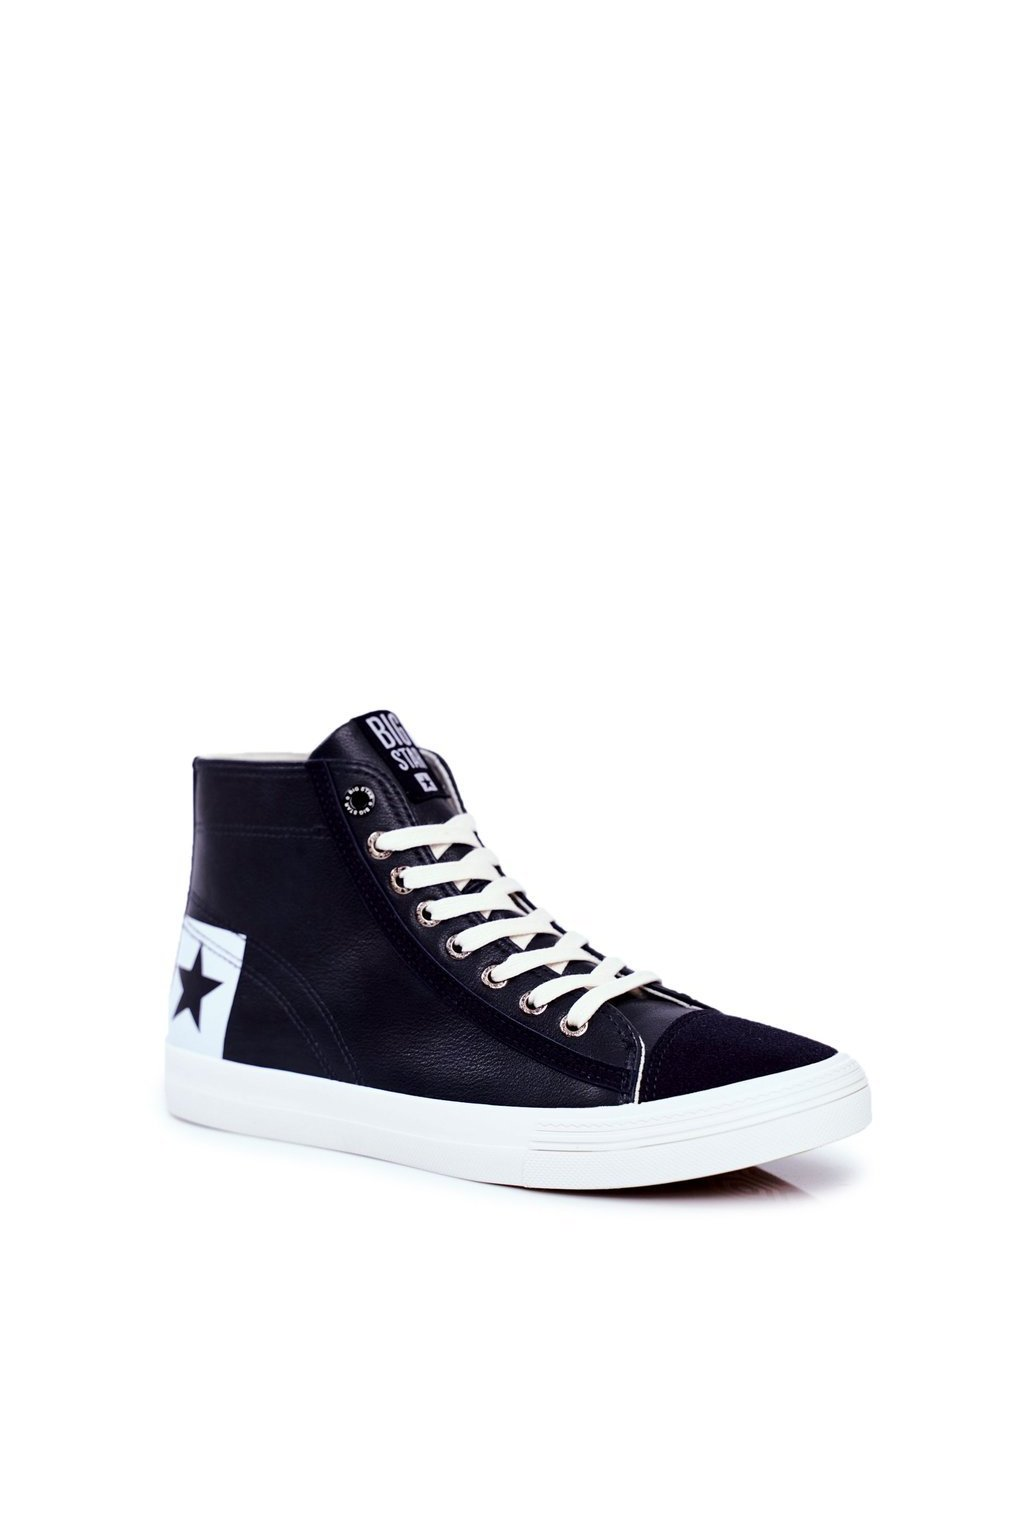 Modrá obuv kód topánok EE174065 NAVY